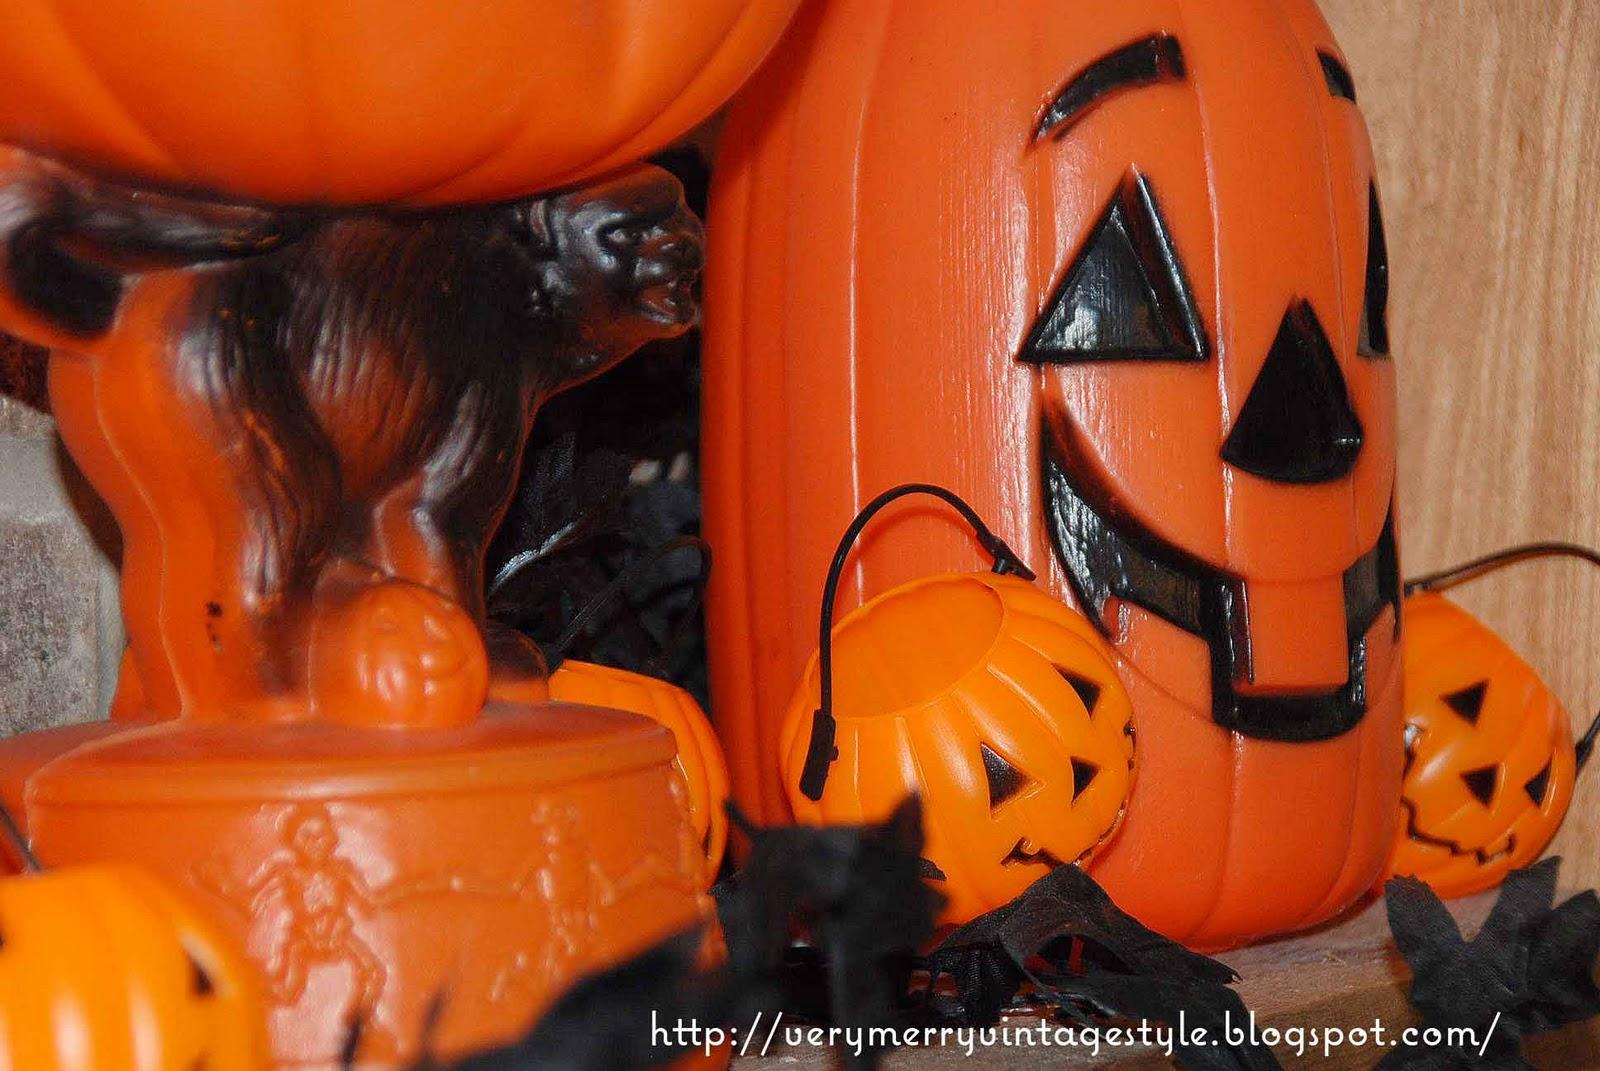 Vintage halloween decorations plastic - Cute Spooky Vintage Halloween Mantel Decorations